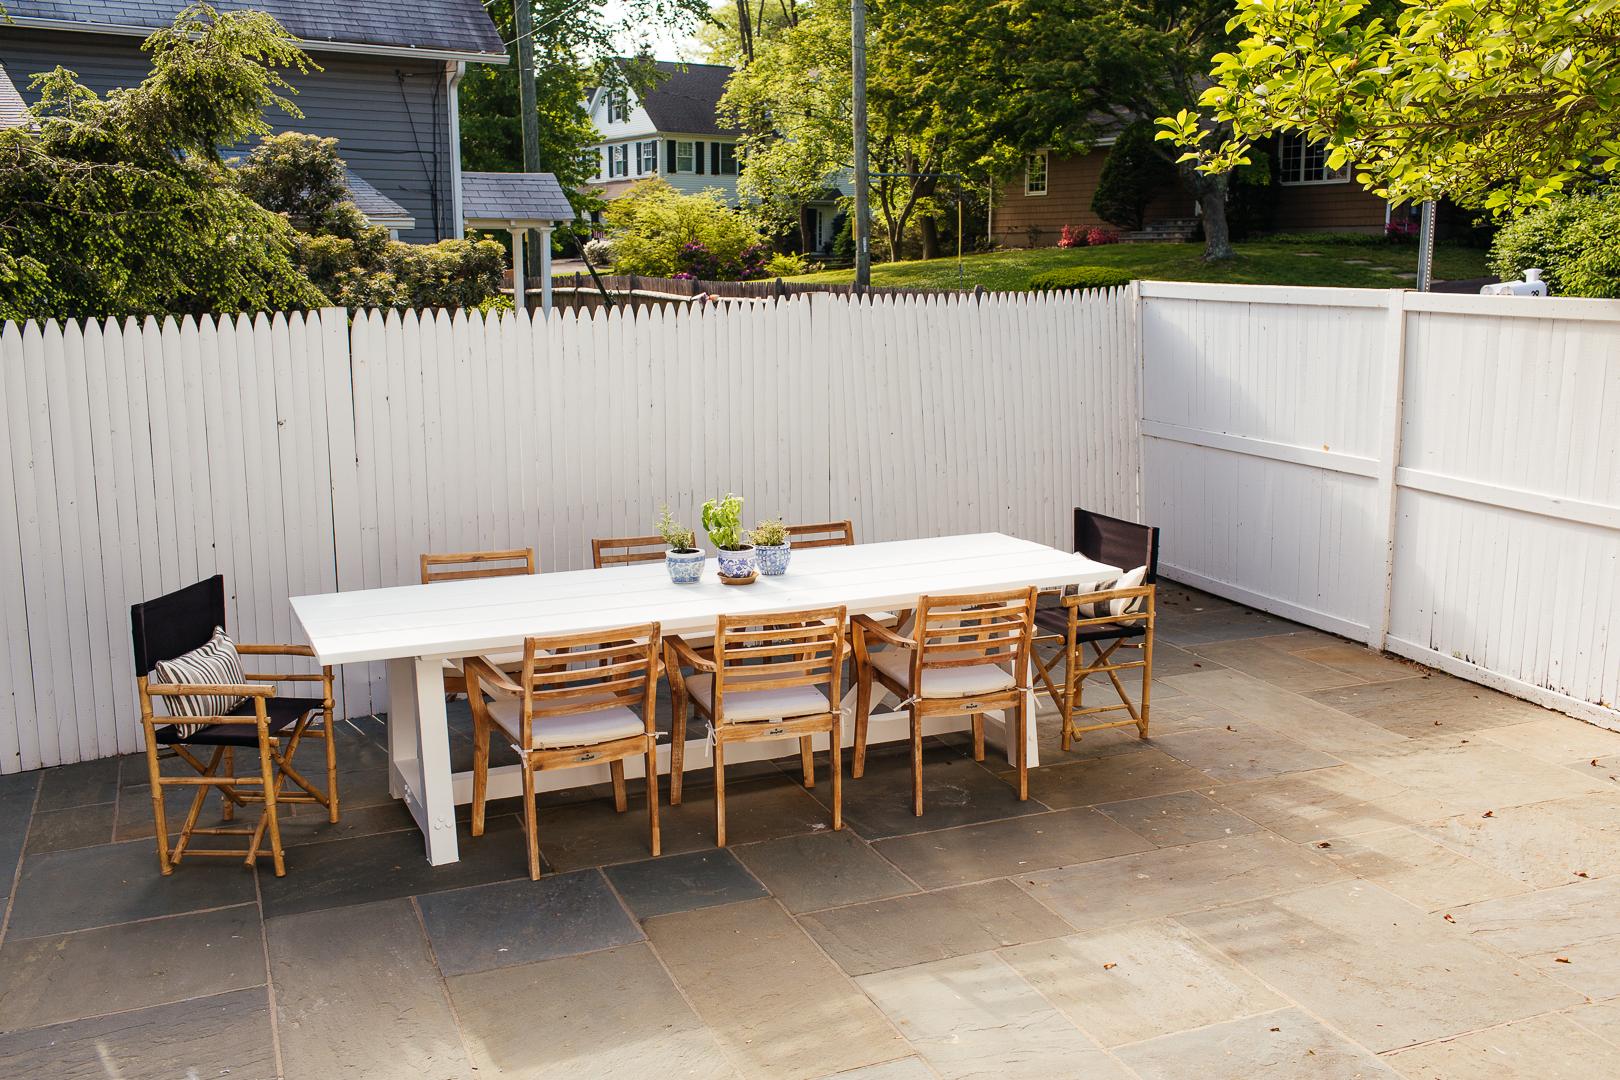 Building an outdoor dining table  Erin Kestenbaum